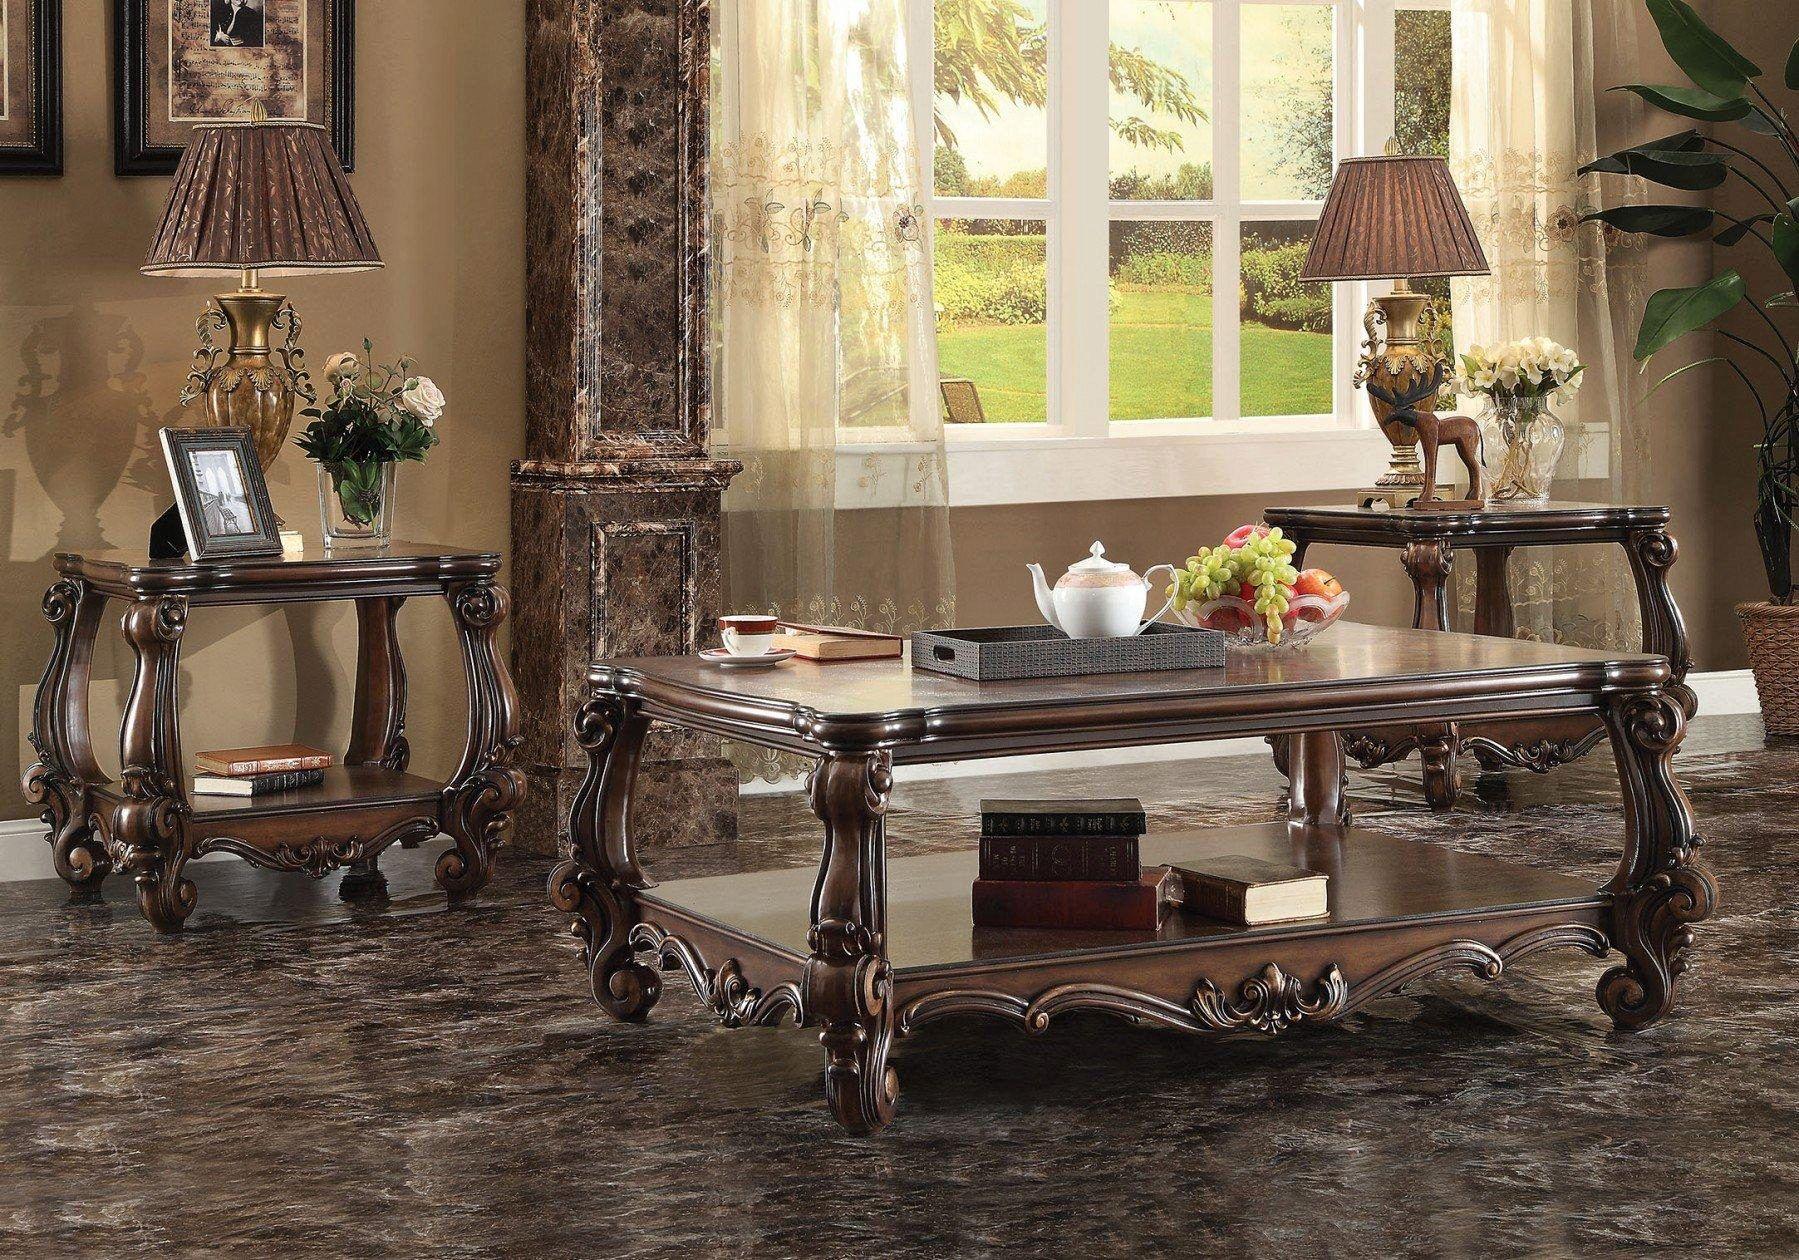 Cherry Oak Coffee Table Set 3pcs 82120 Versailles Acme Carved Wood Classic Versailles 82120 Set 3 Living Room Table Sets Oak Coffee Table Coffee Table With Storage [ 1260 x 1799 Pixel ]